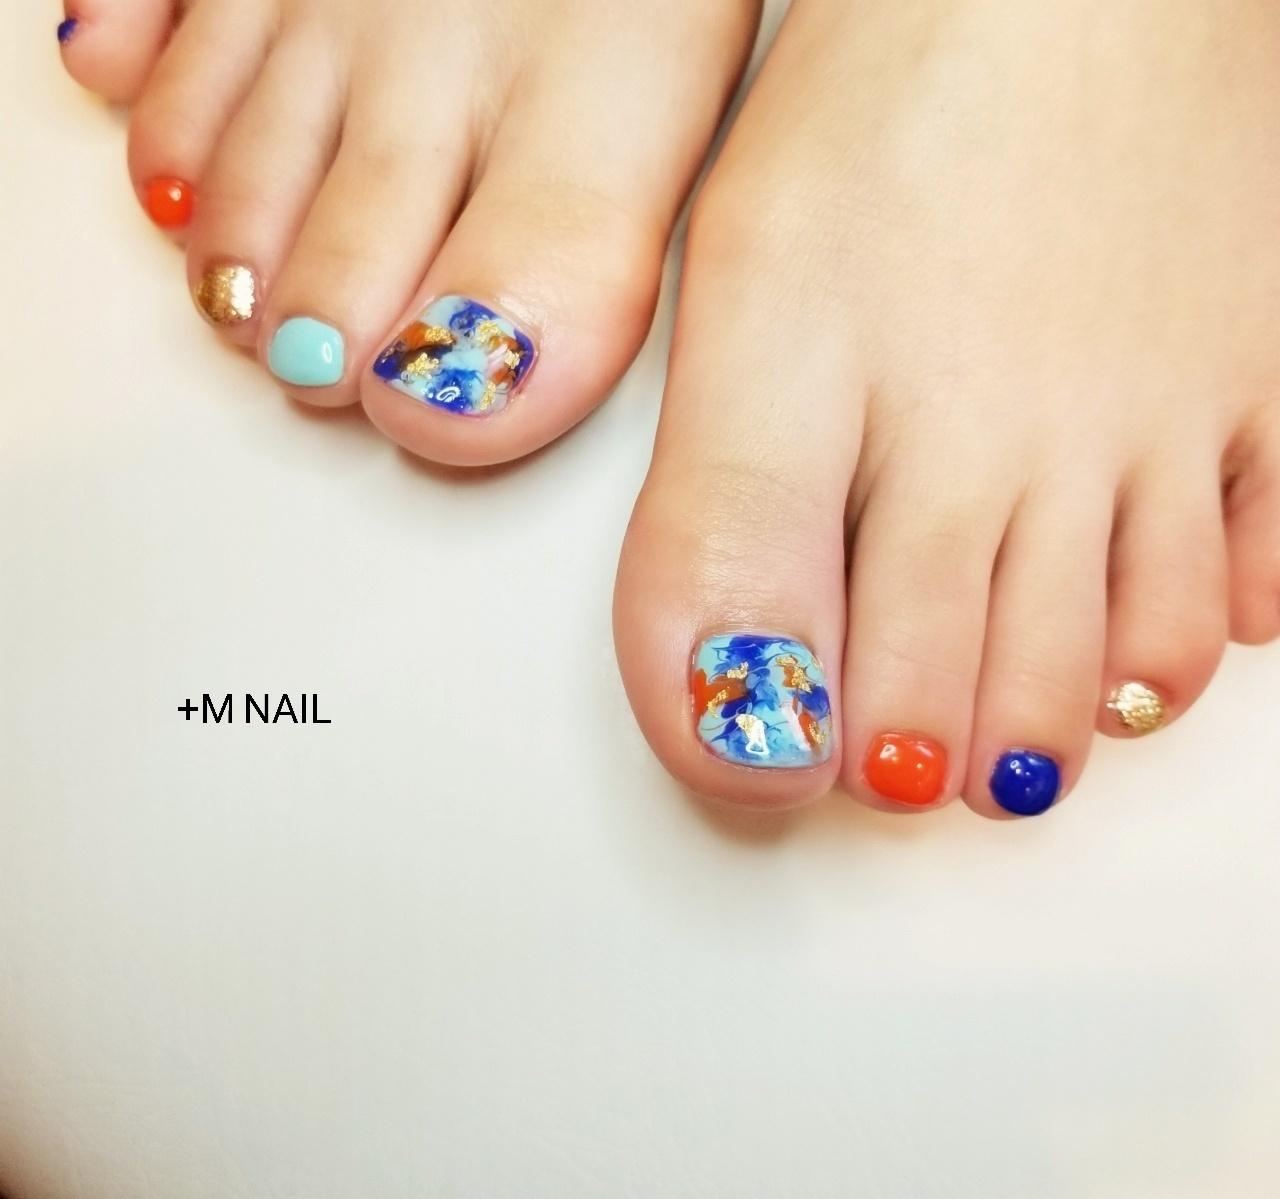 #nails #ジェル #ジェルネイル #ネイル #ネイルサロン #ネイルデザイン #大人可愛い #フットネイル #タイダイネイル #カラフルネイル #カジュアルネイル